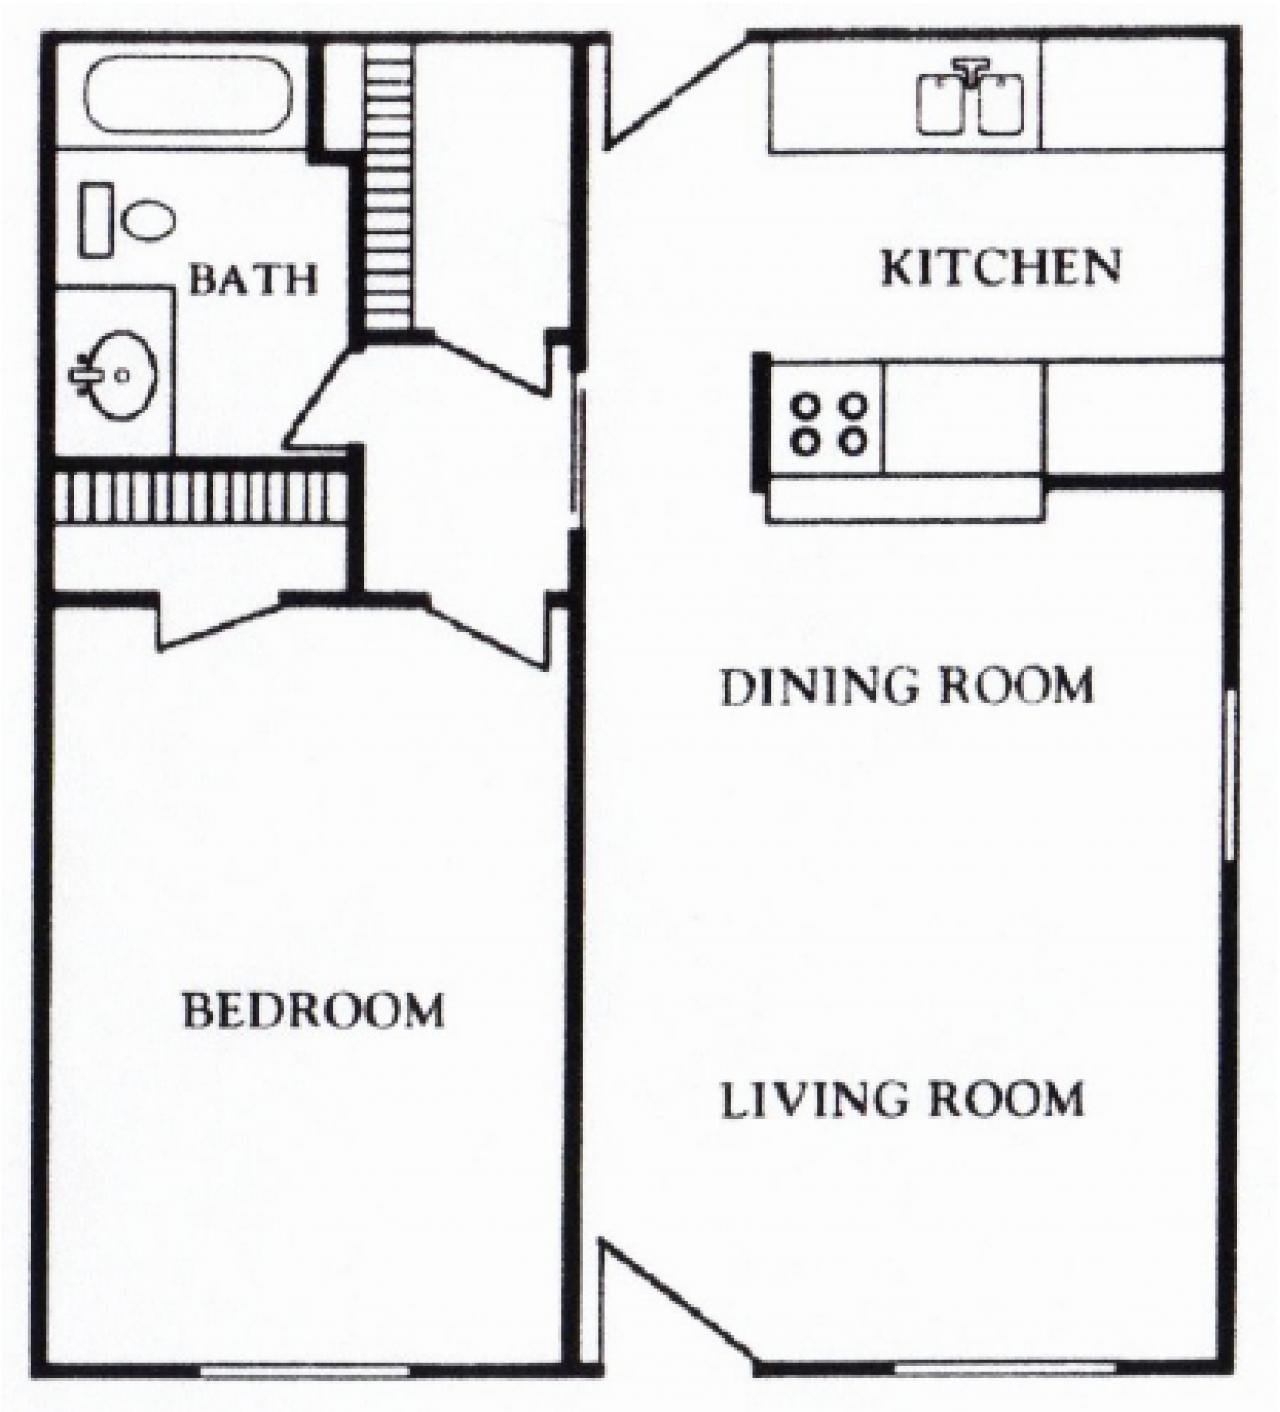 Houston Texas - Mont Belvieu Apartment Floor Plan 1 bed 1 bath 622 square feet